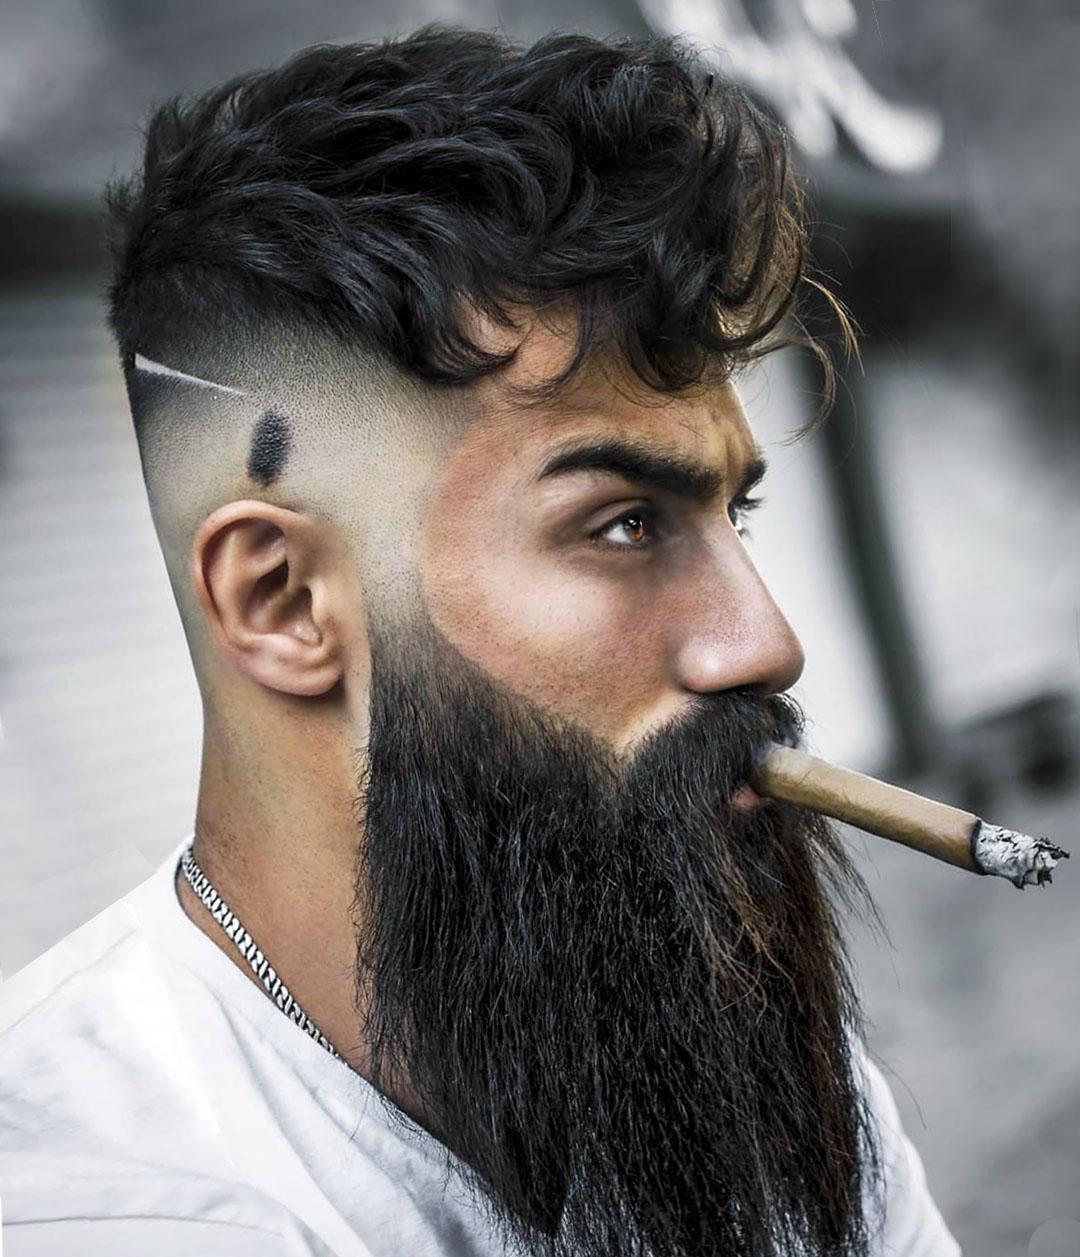 High Fade Undercut Hairstyle with Long Full Beard